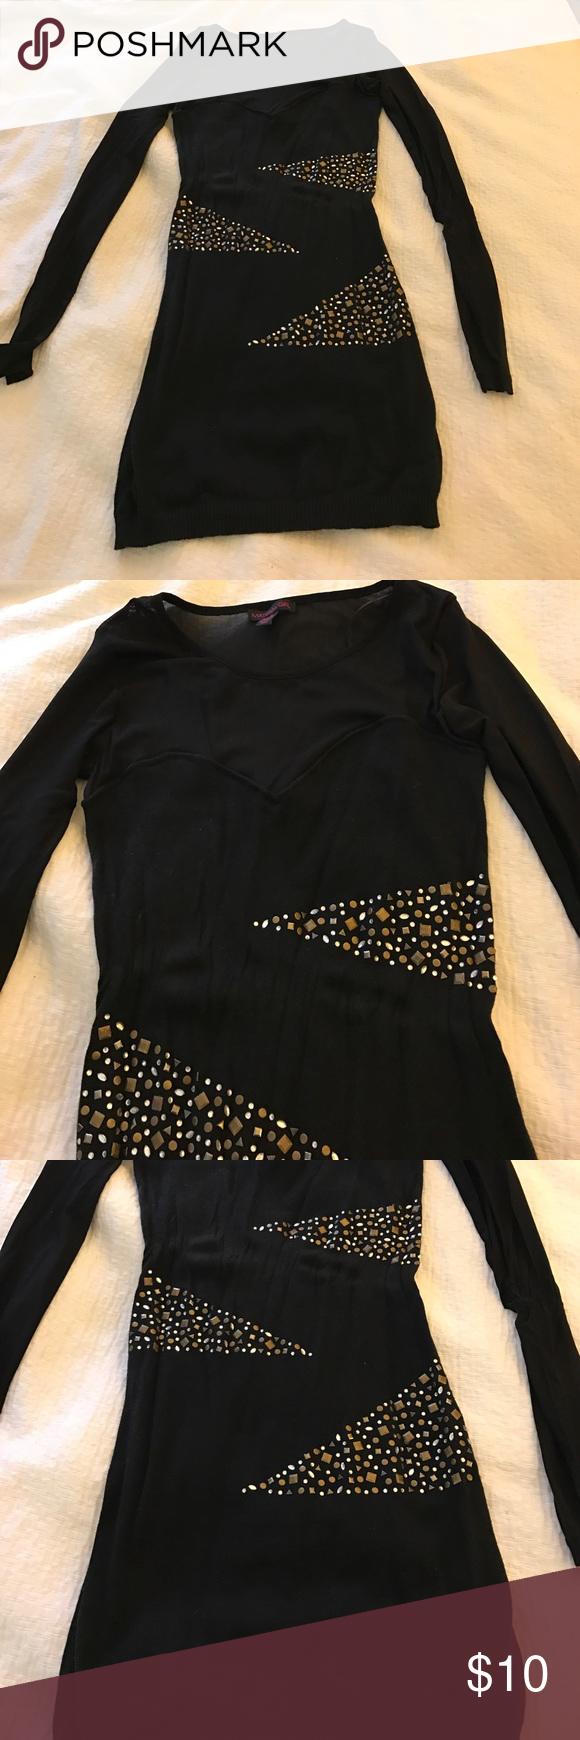 Material girl black dress s material girl from macys black sweater